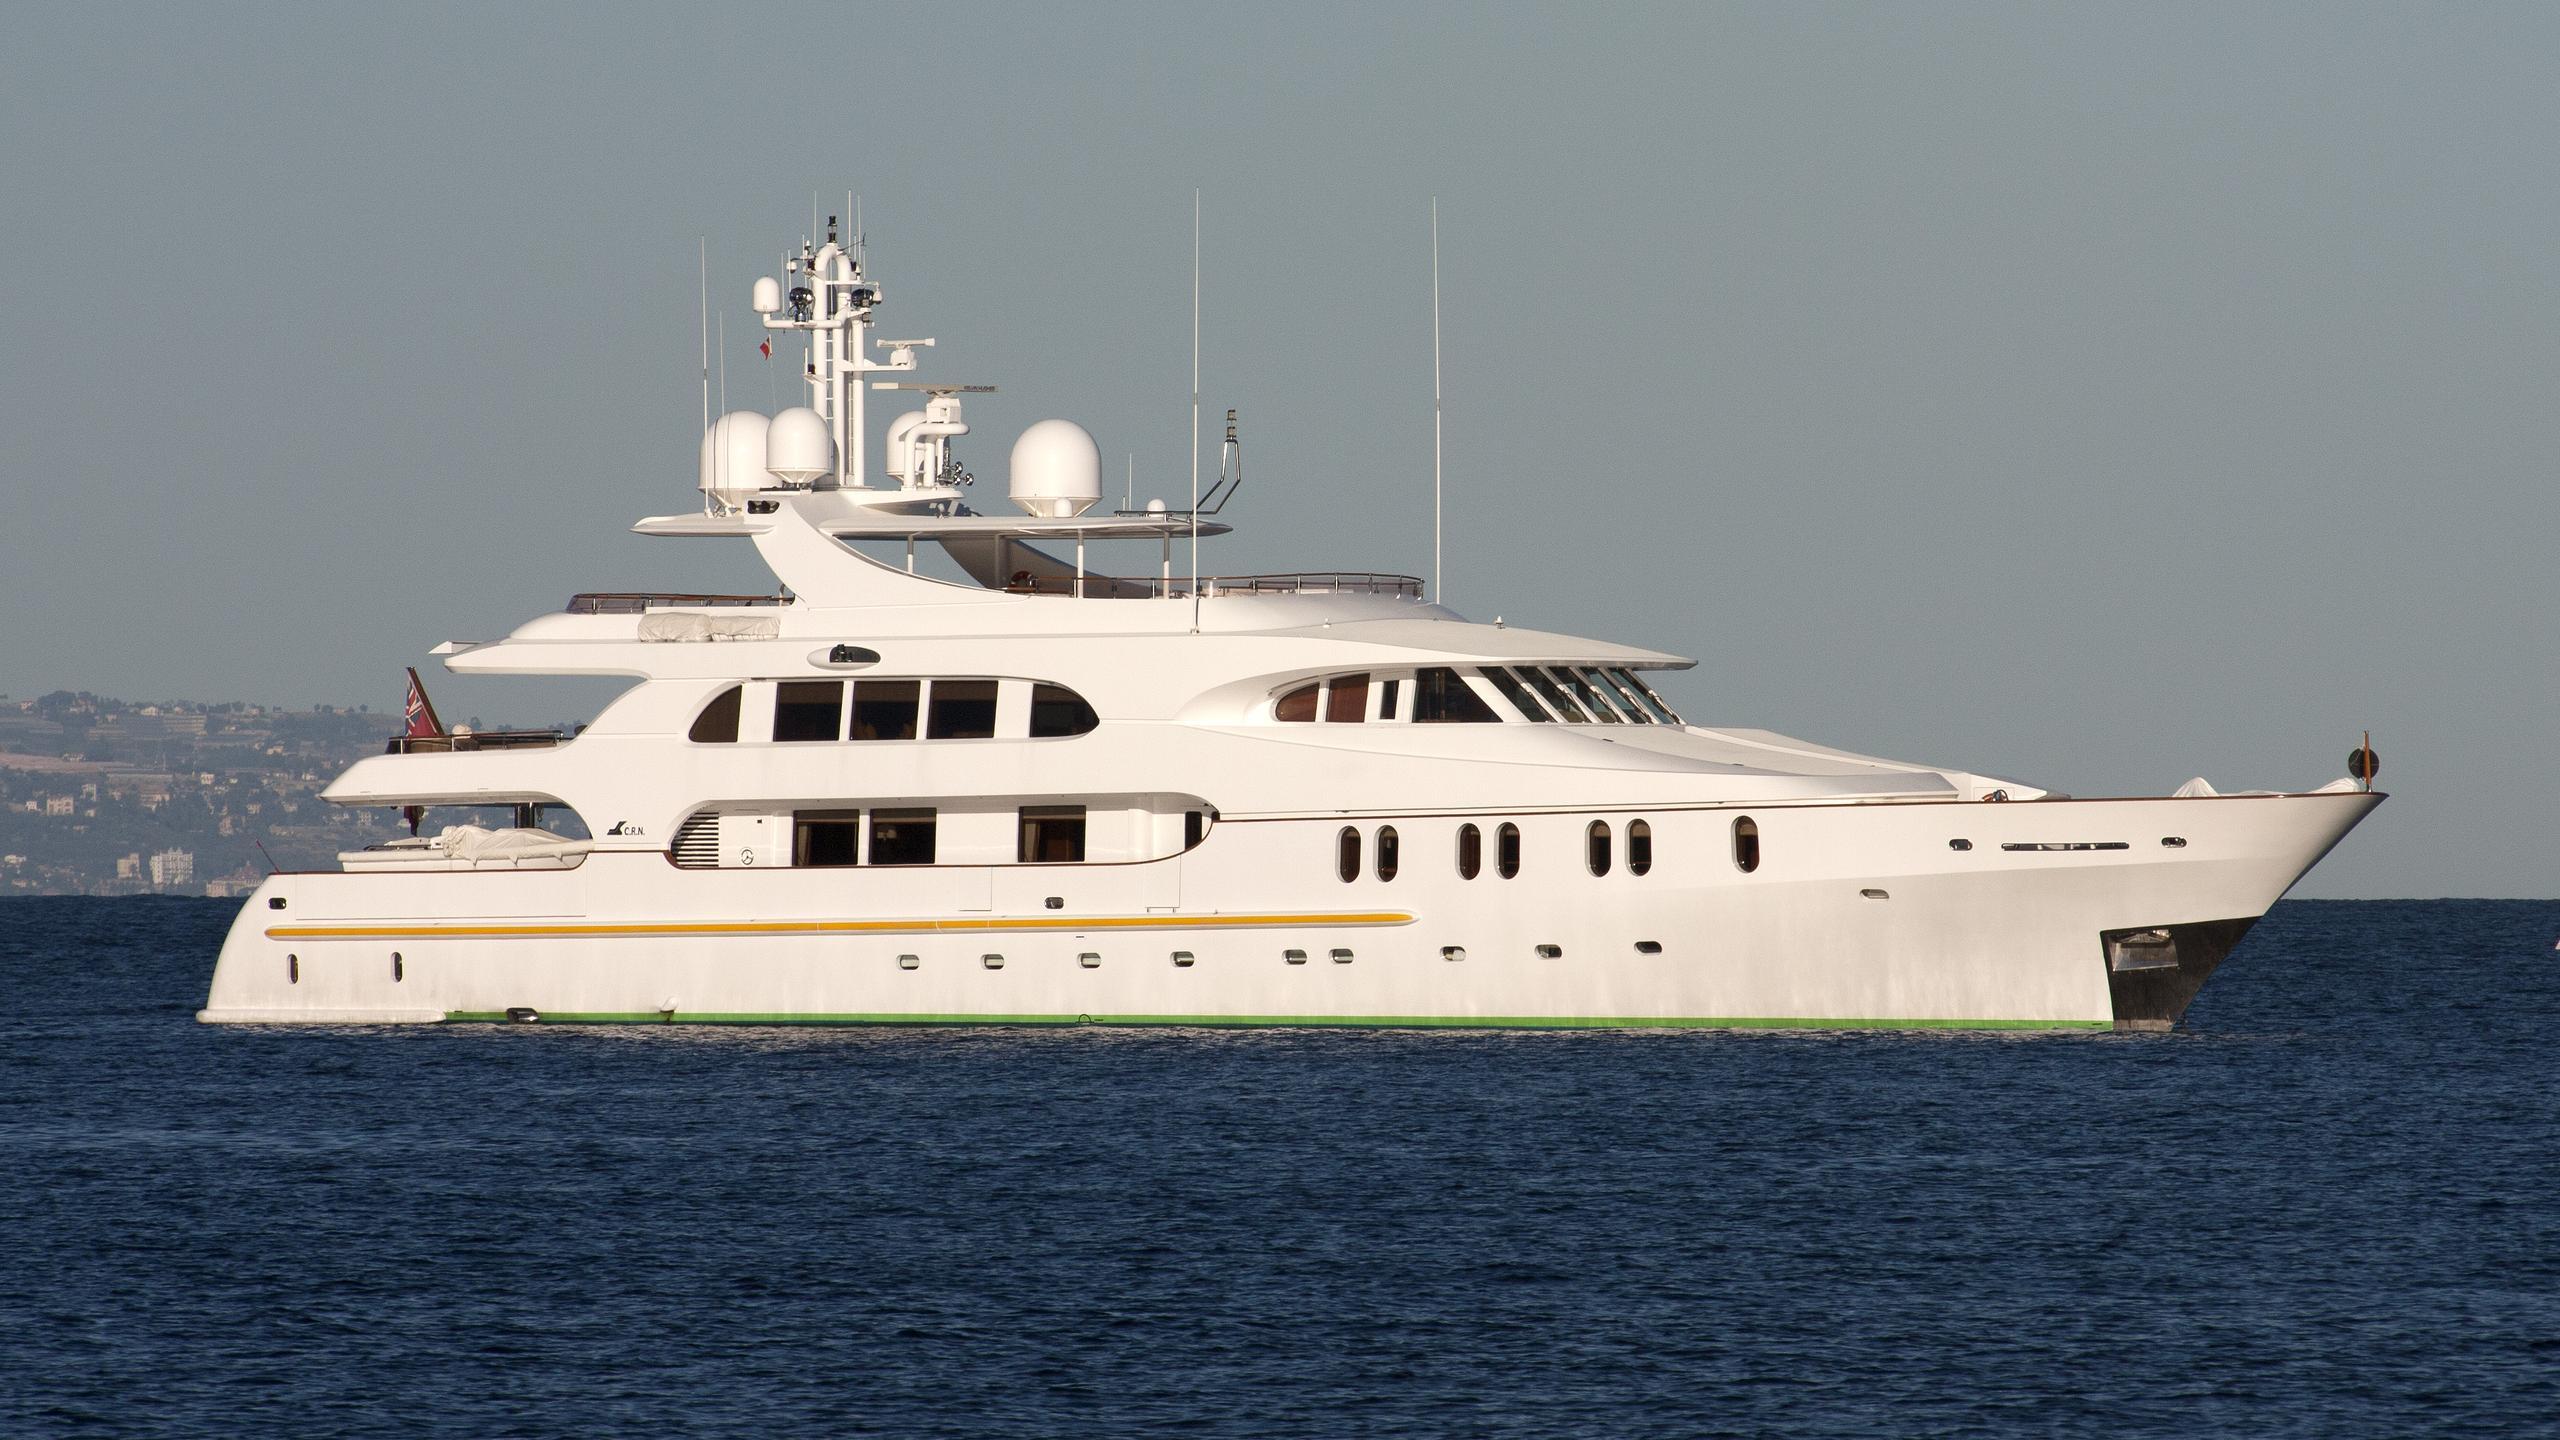 dr-no-no-motoryacht-crn-1998-50m-profile